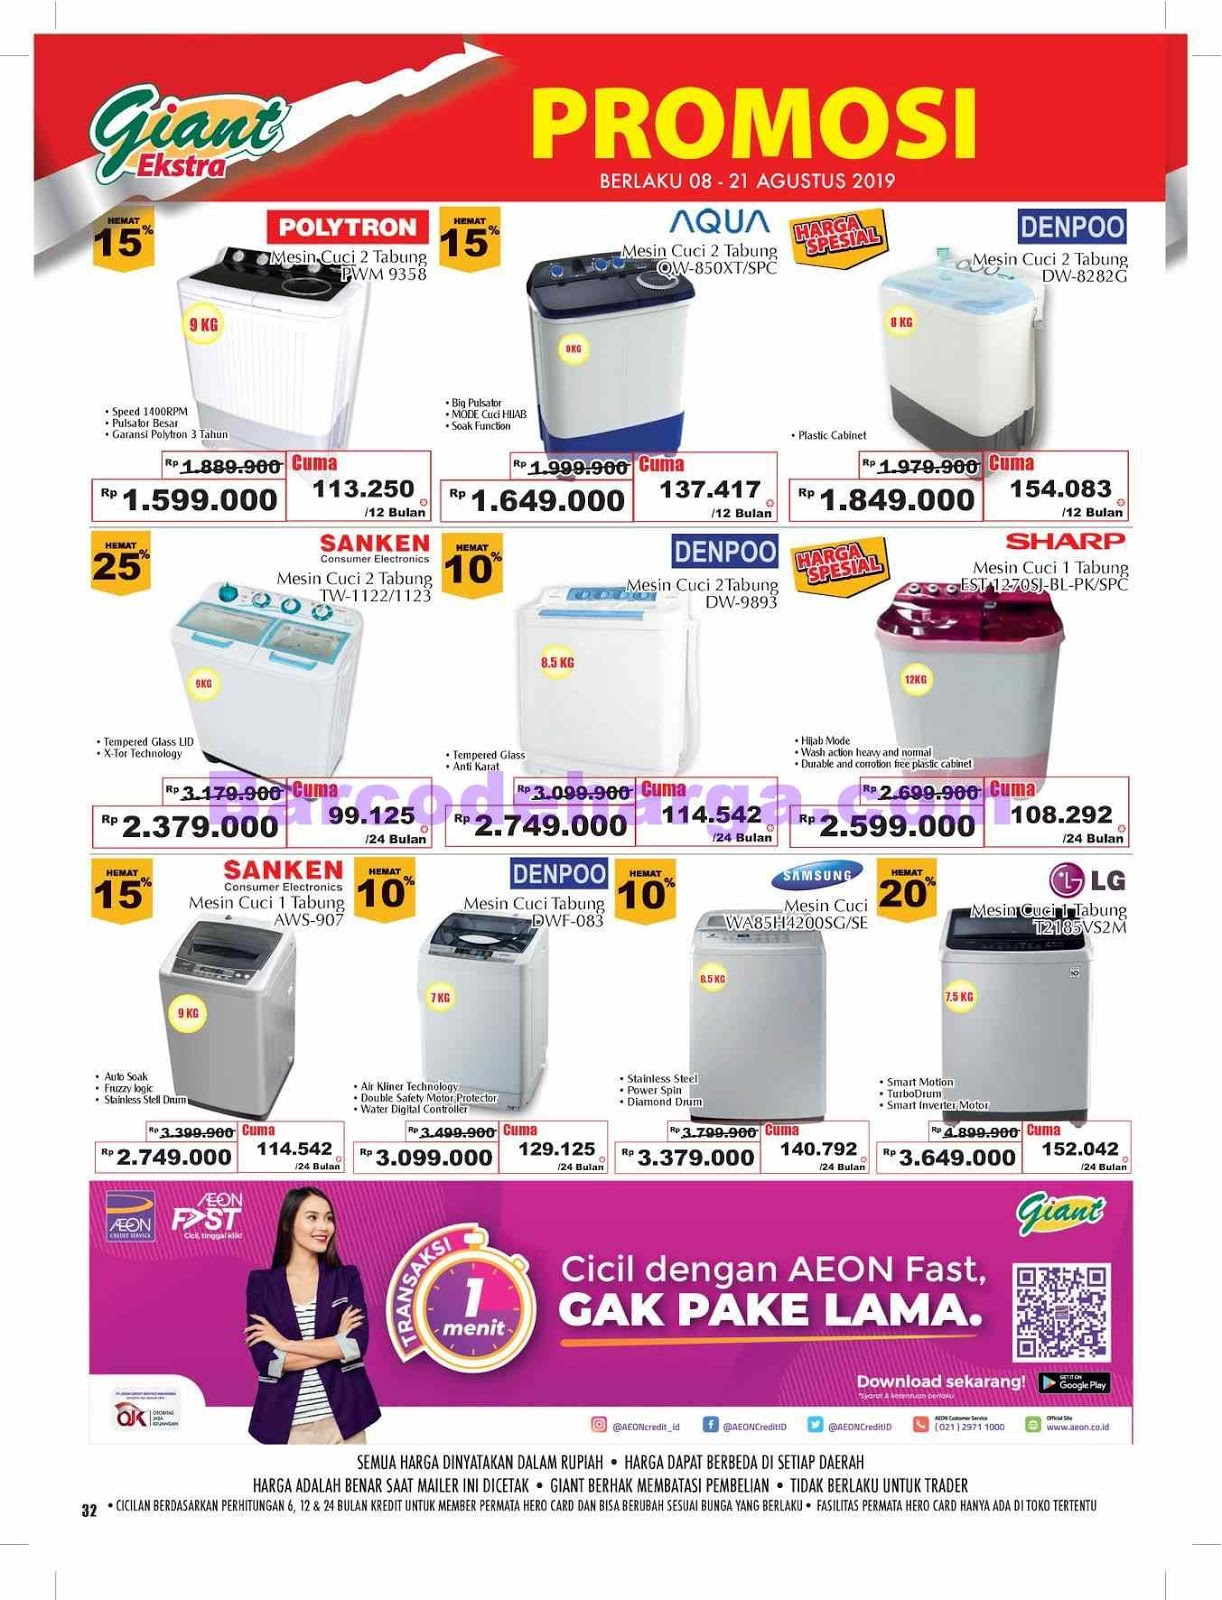 Katalog Promo Giant Ekstra Terbaru 29 Oktober 11 November 2020 Barcodeharga Harga Promo Alfamart Indomaret Giant Hypermart Superindo Lottemart Carrefour